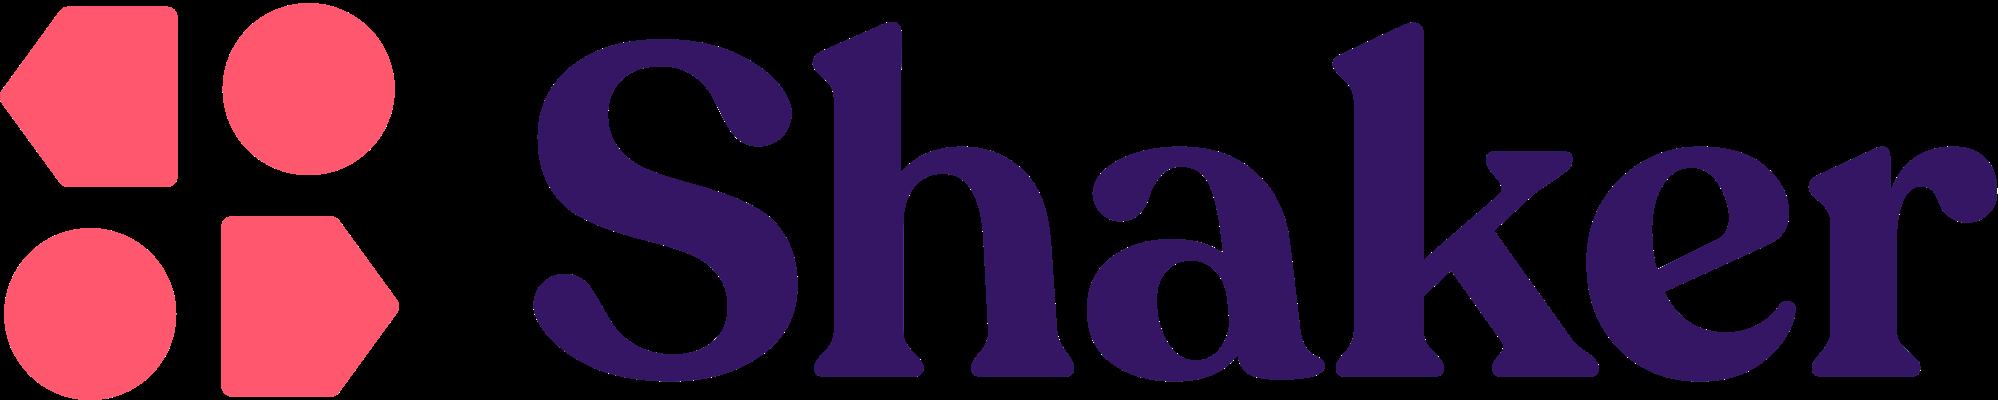 Shaker_logo_png